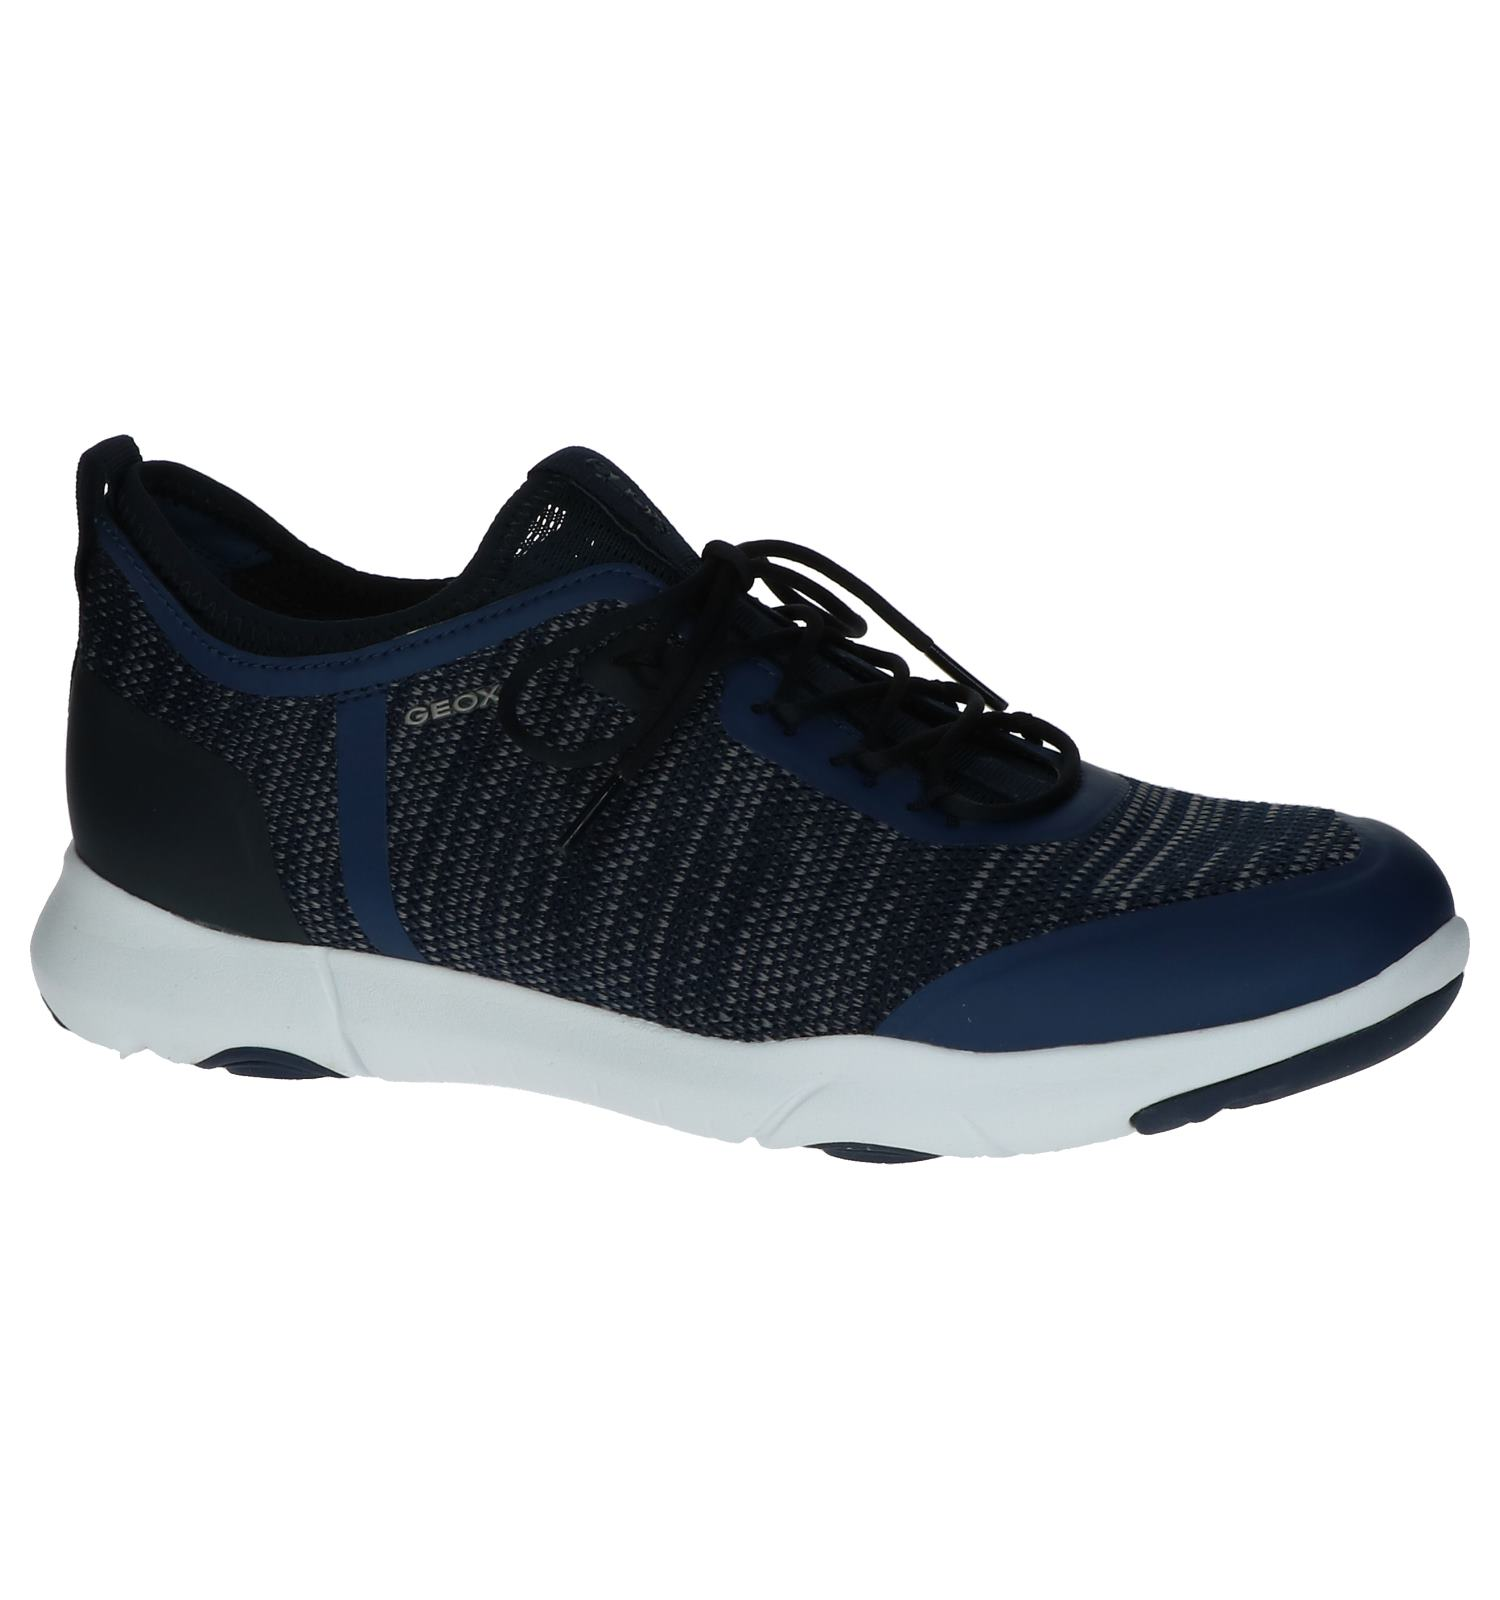 57dd79f6cf9 Geox Nebula Sneakers Donkerblauw | TORFS.BE | Gratis verzend en retour